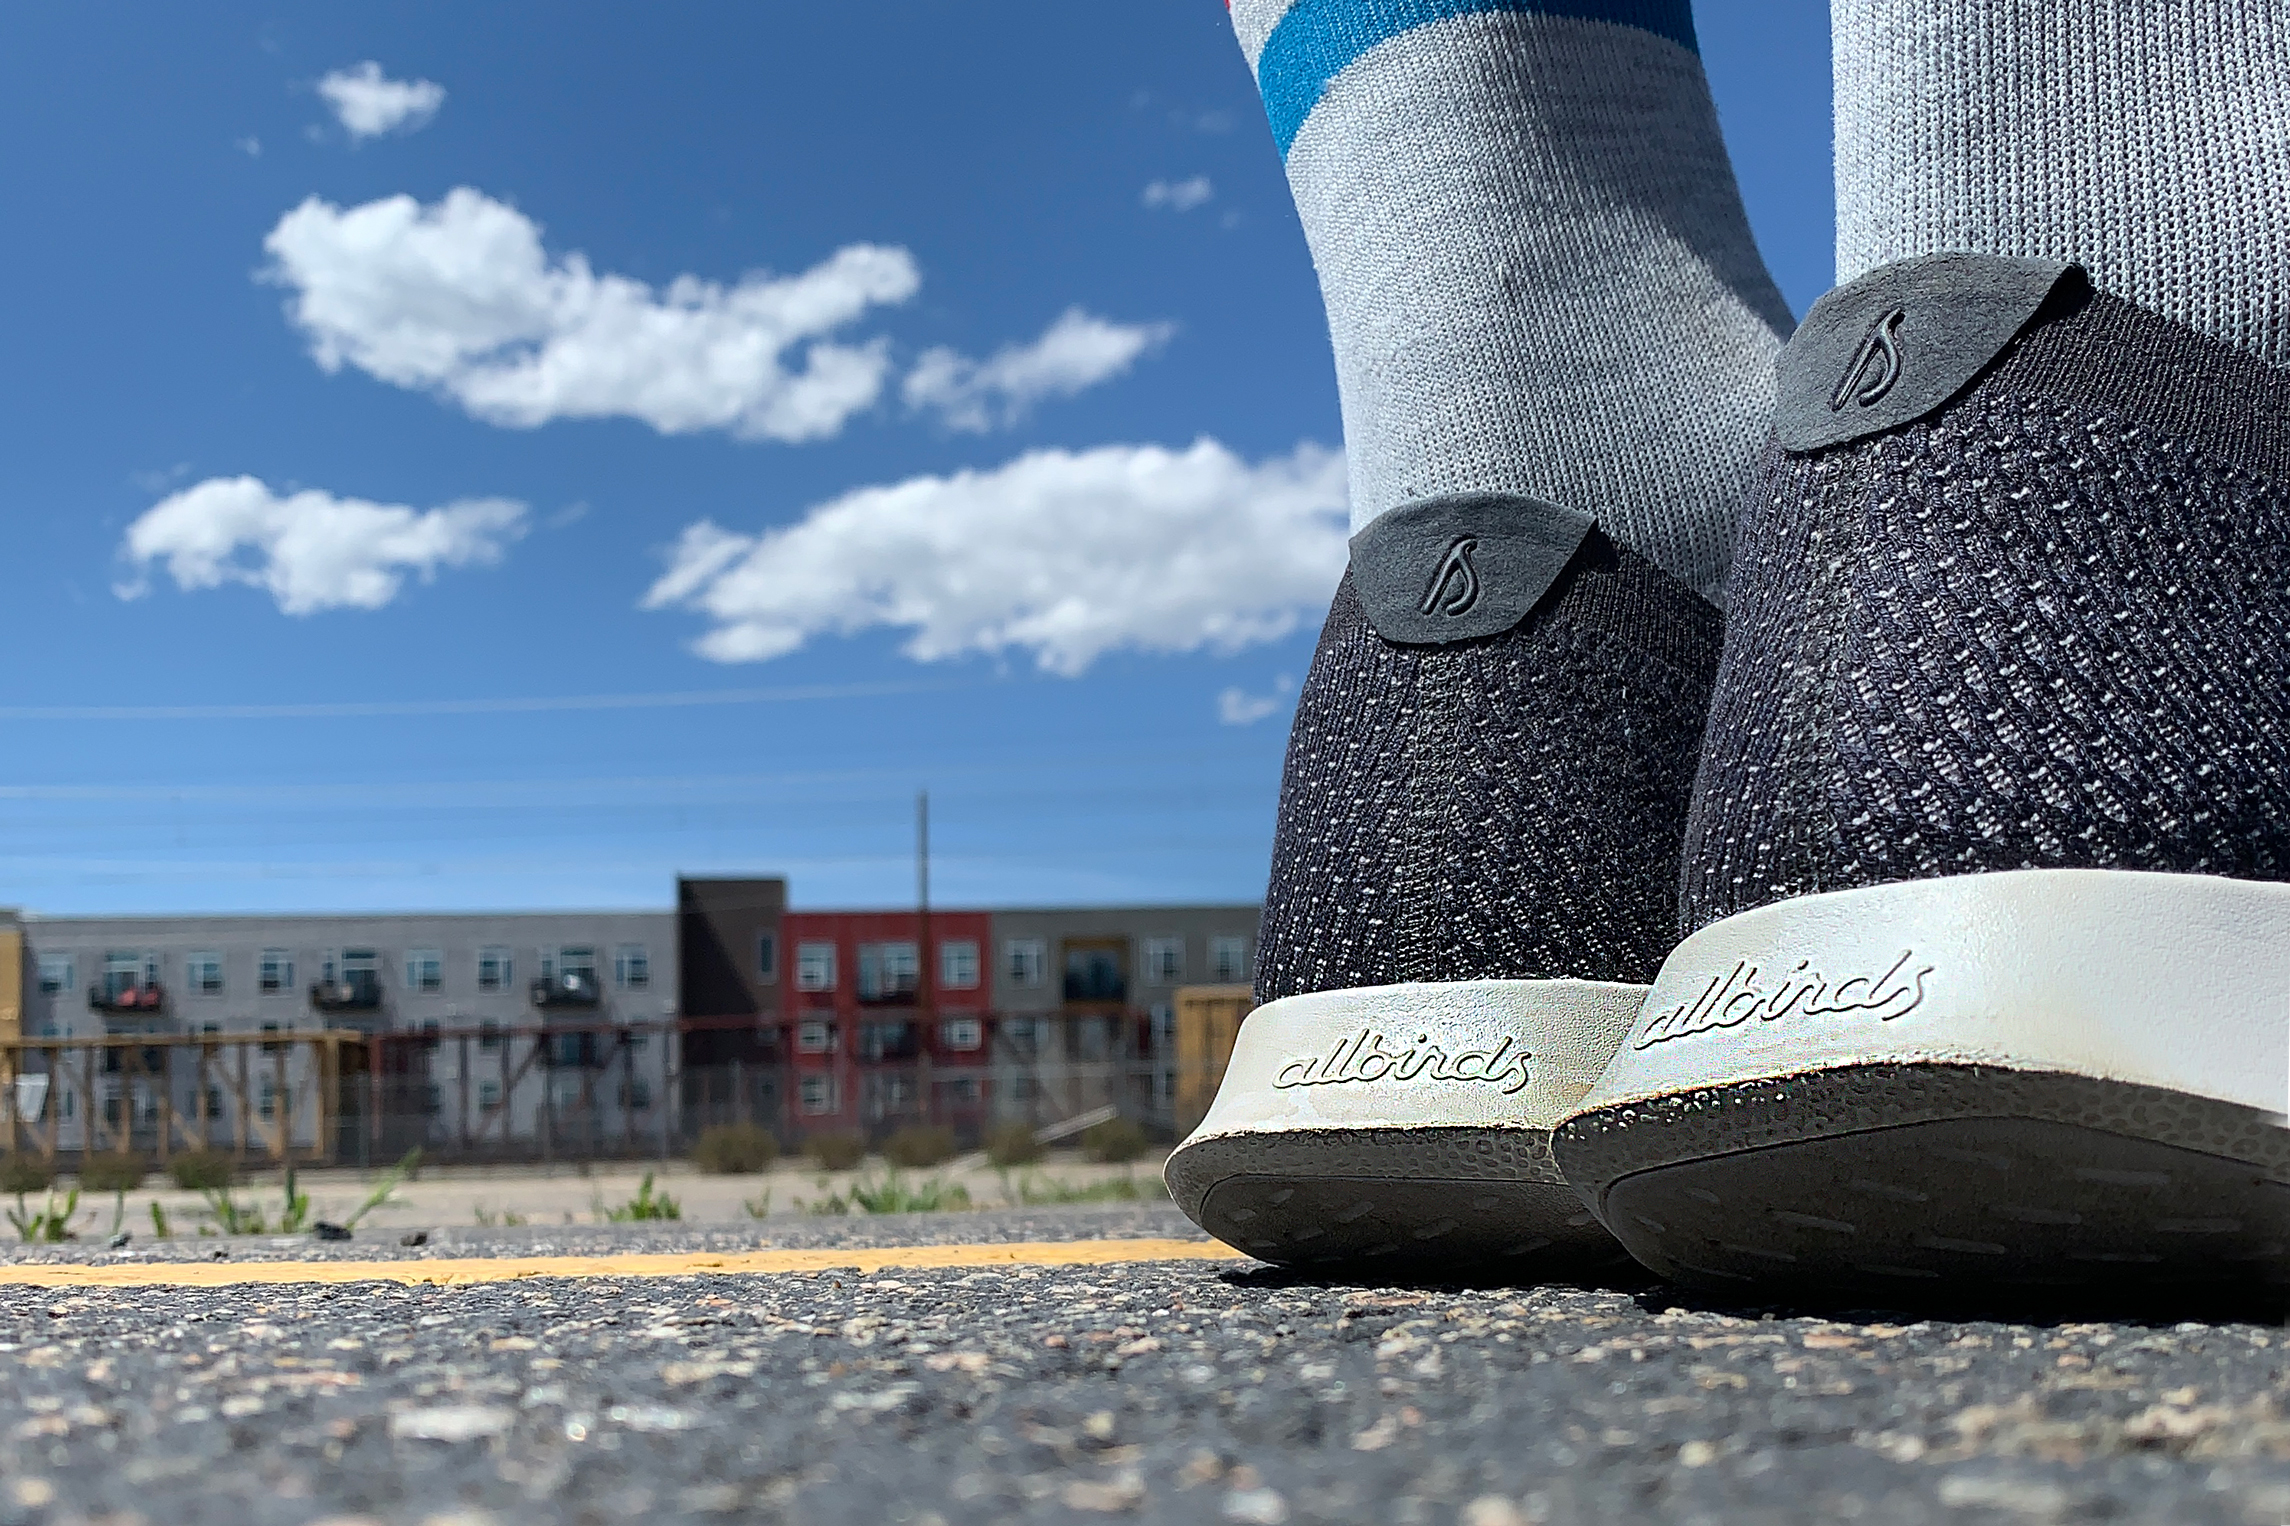 Allbirds Dasher running shoe review